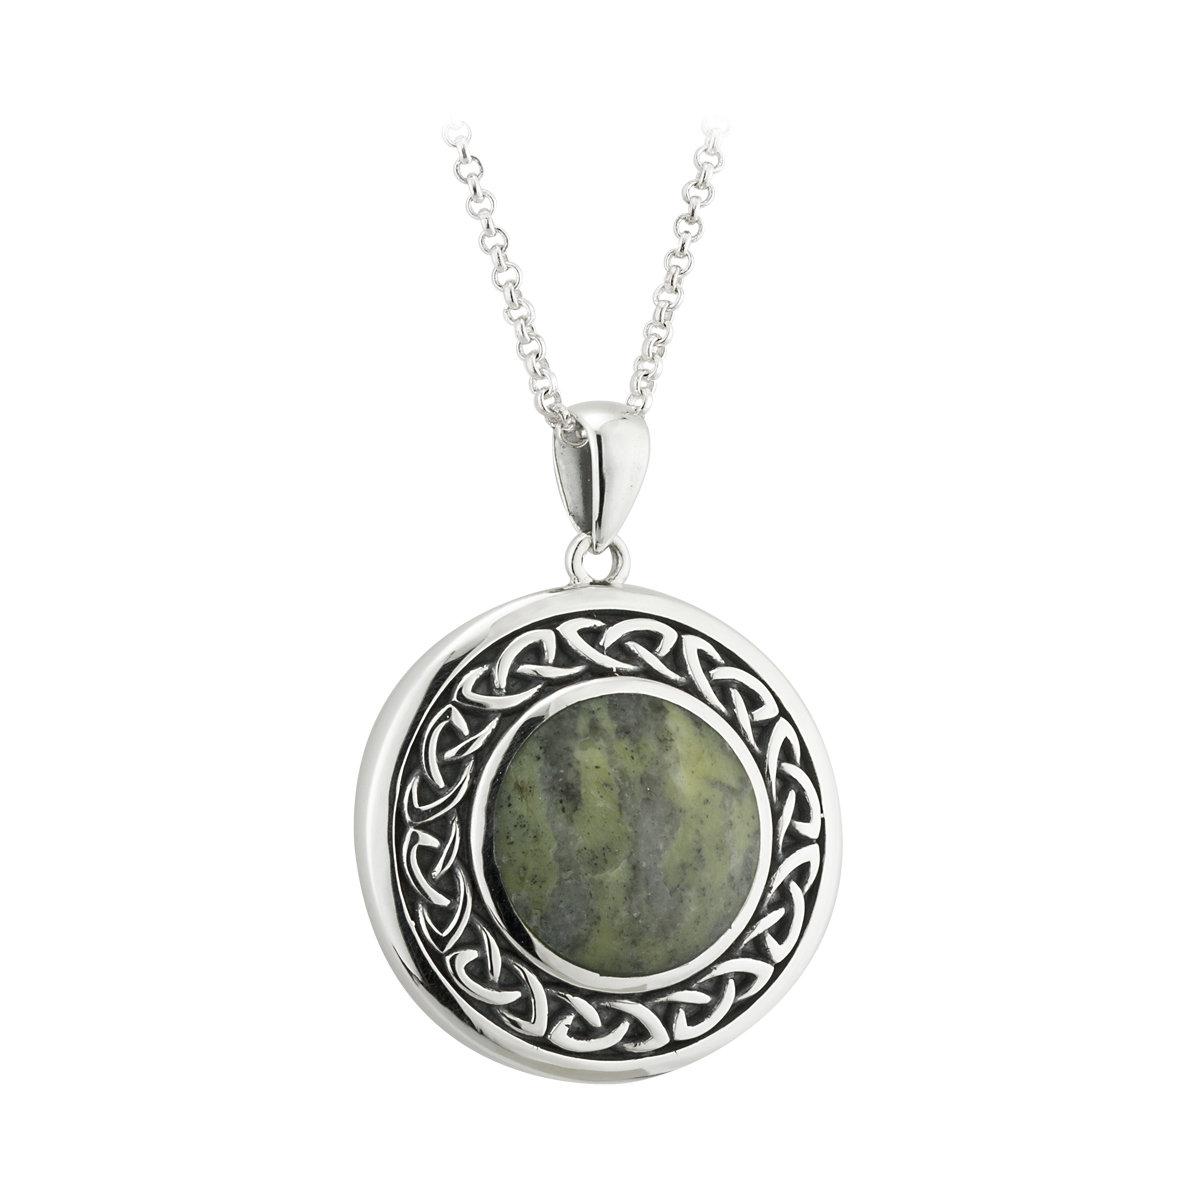 Round connemara marble silver celtic pendant S46133 from Solvar